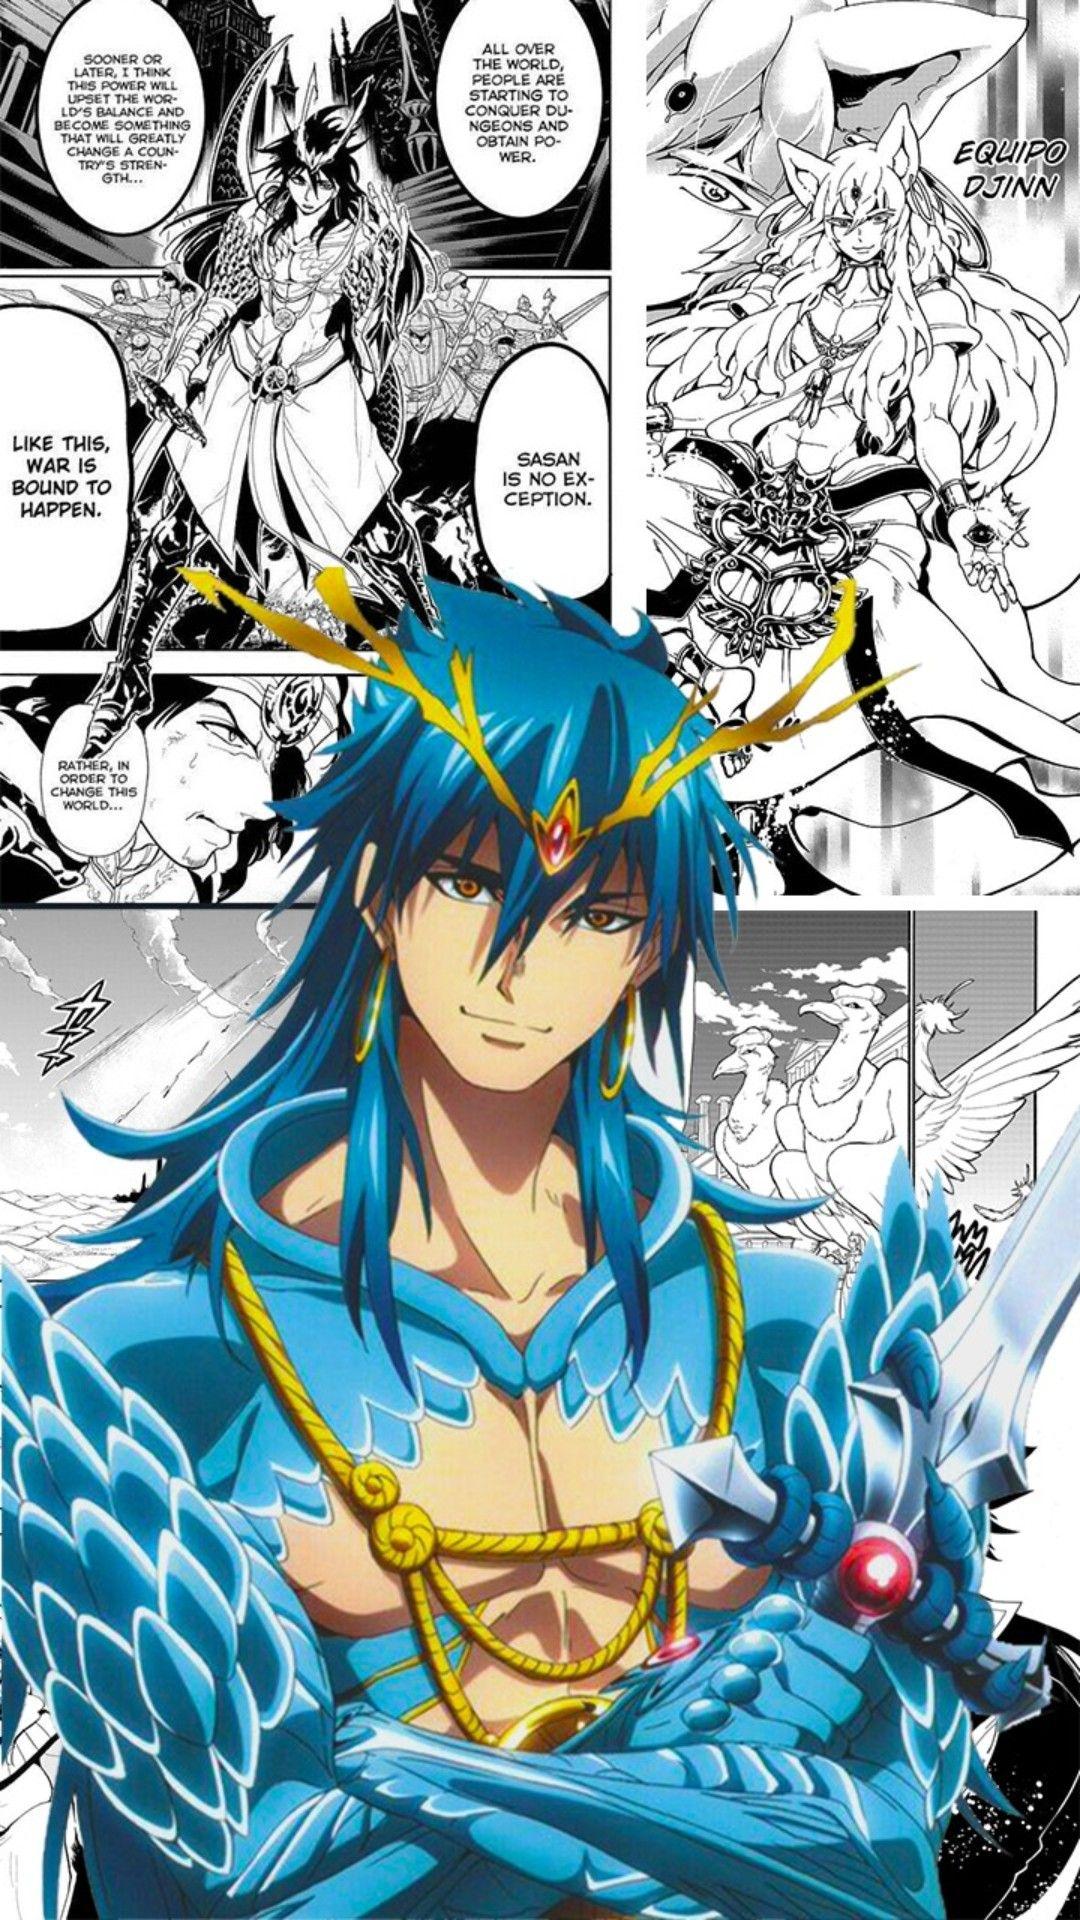 Sinbad Anime Magi Magi Adventures Of Sinbad Sinbad Magi